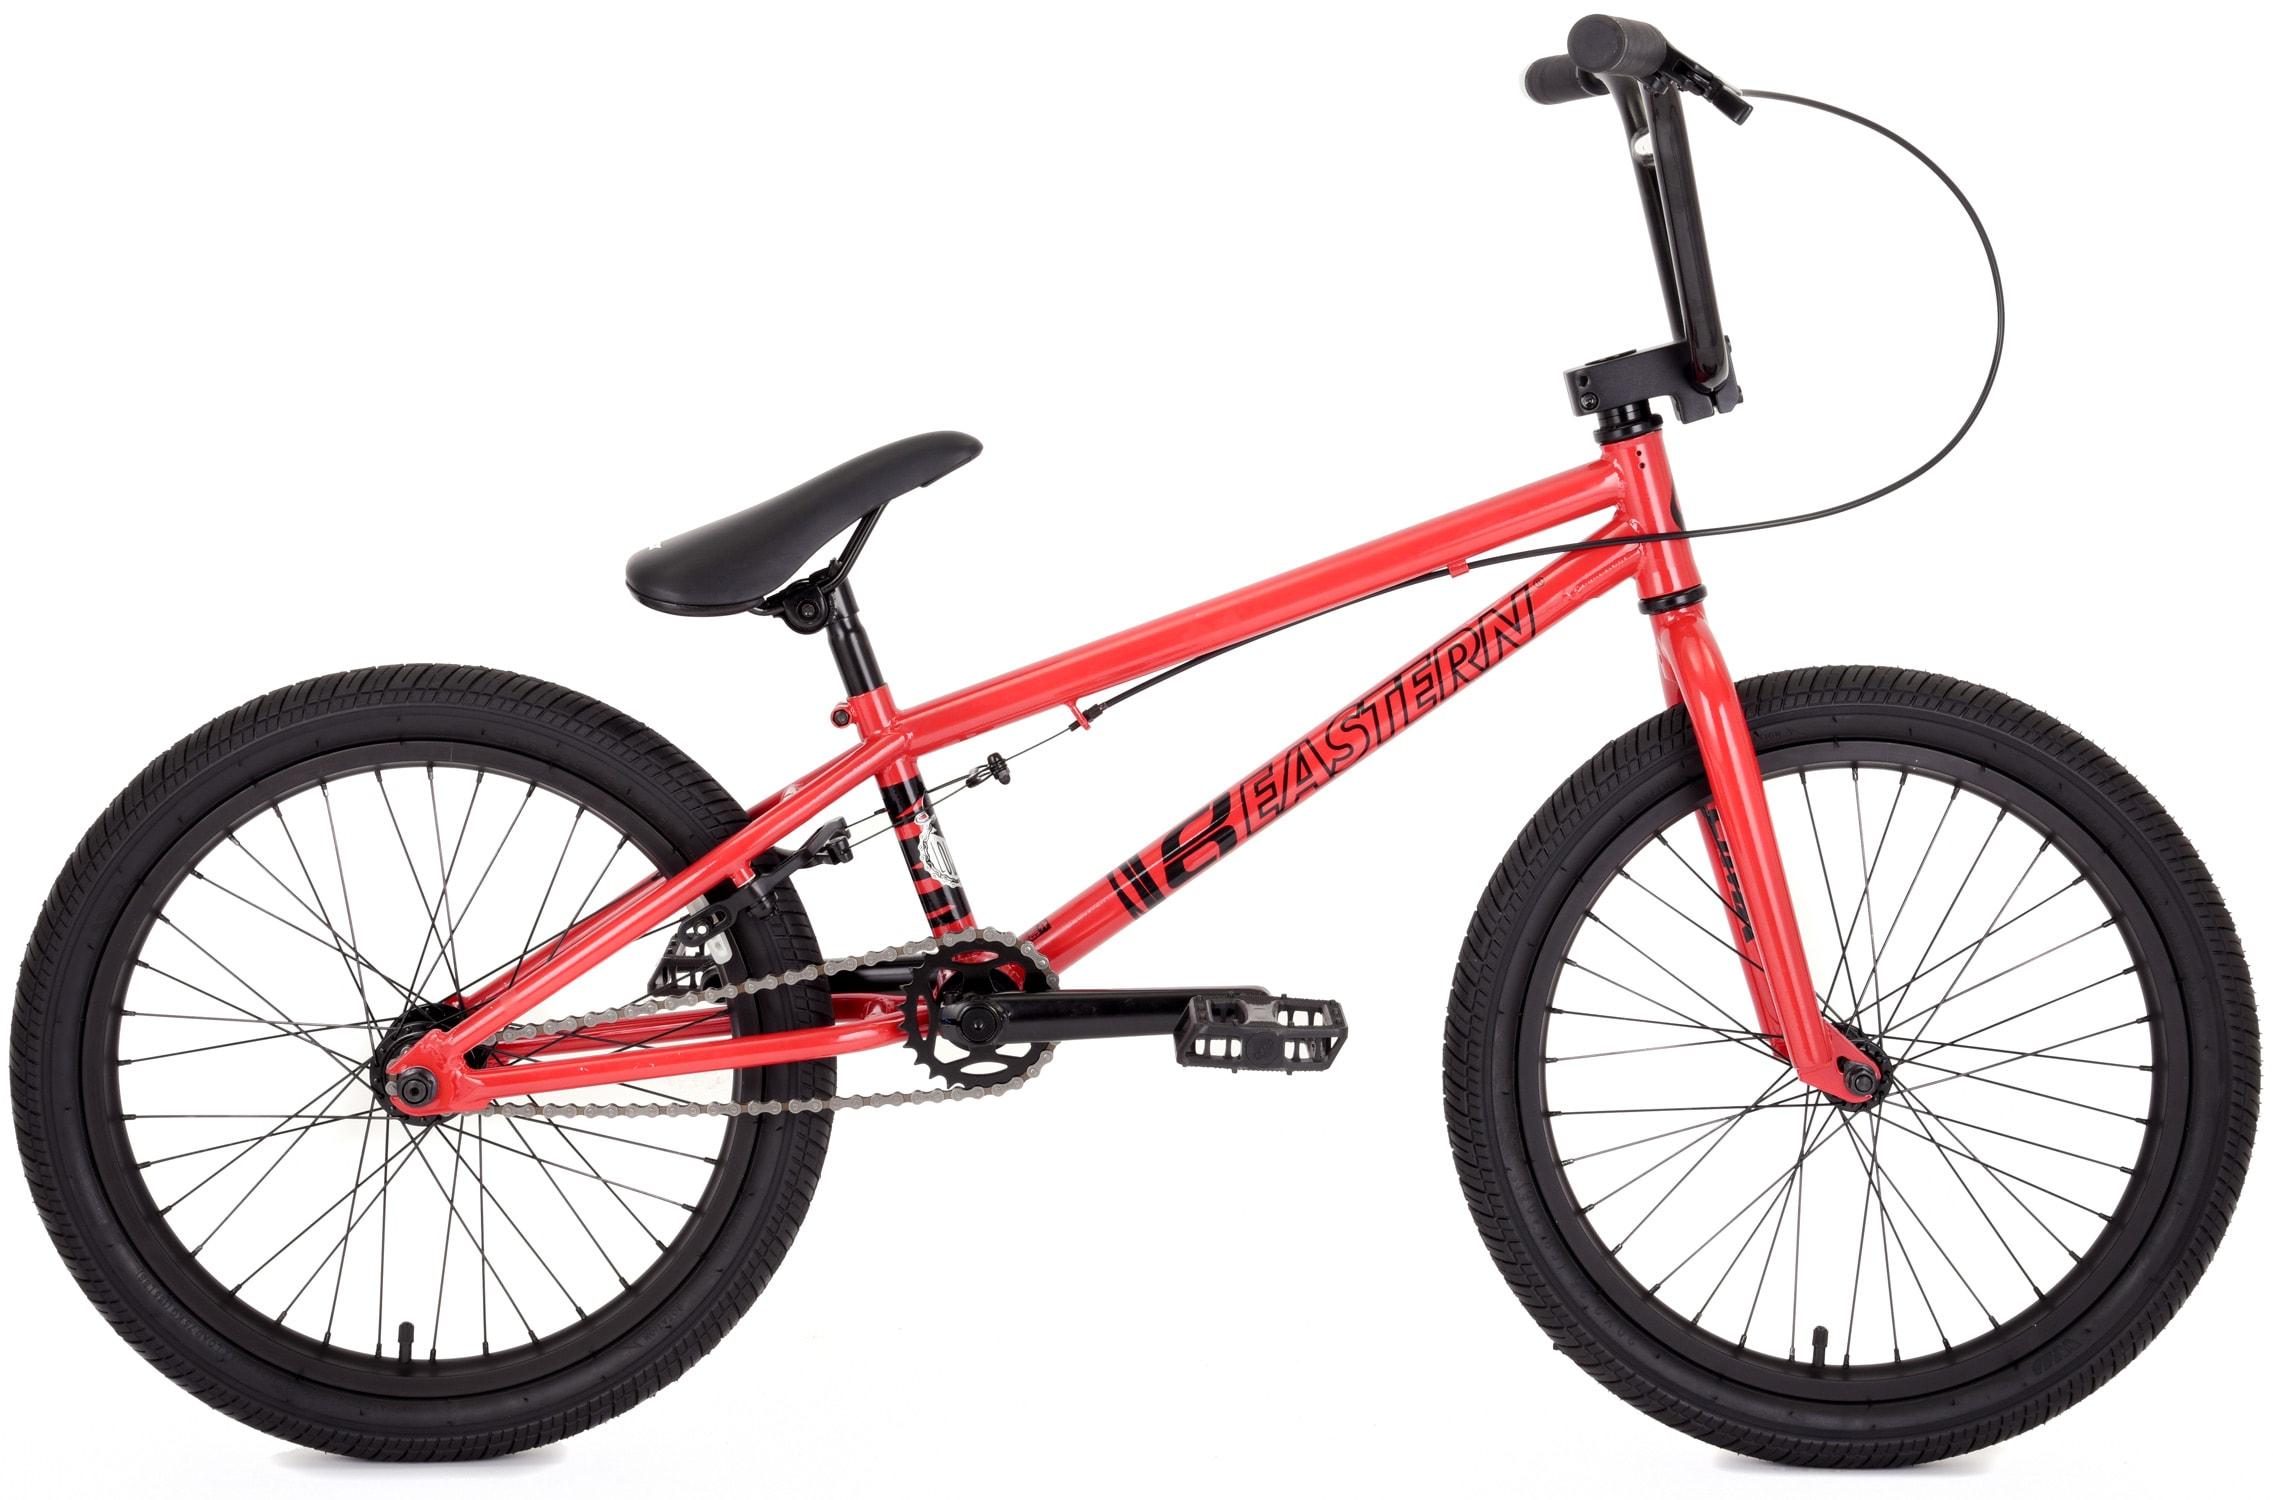 Image of Eastern Lowdown BMX Bike